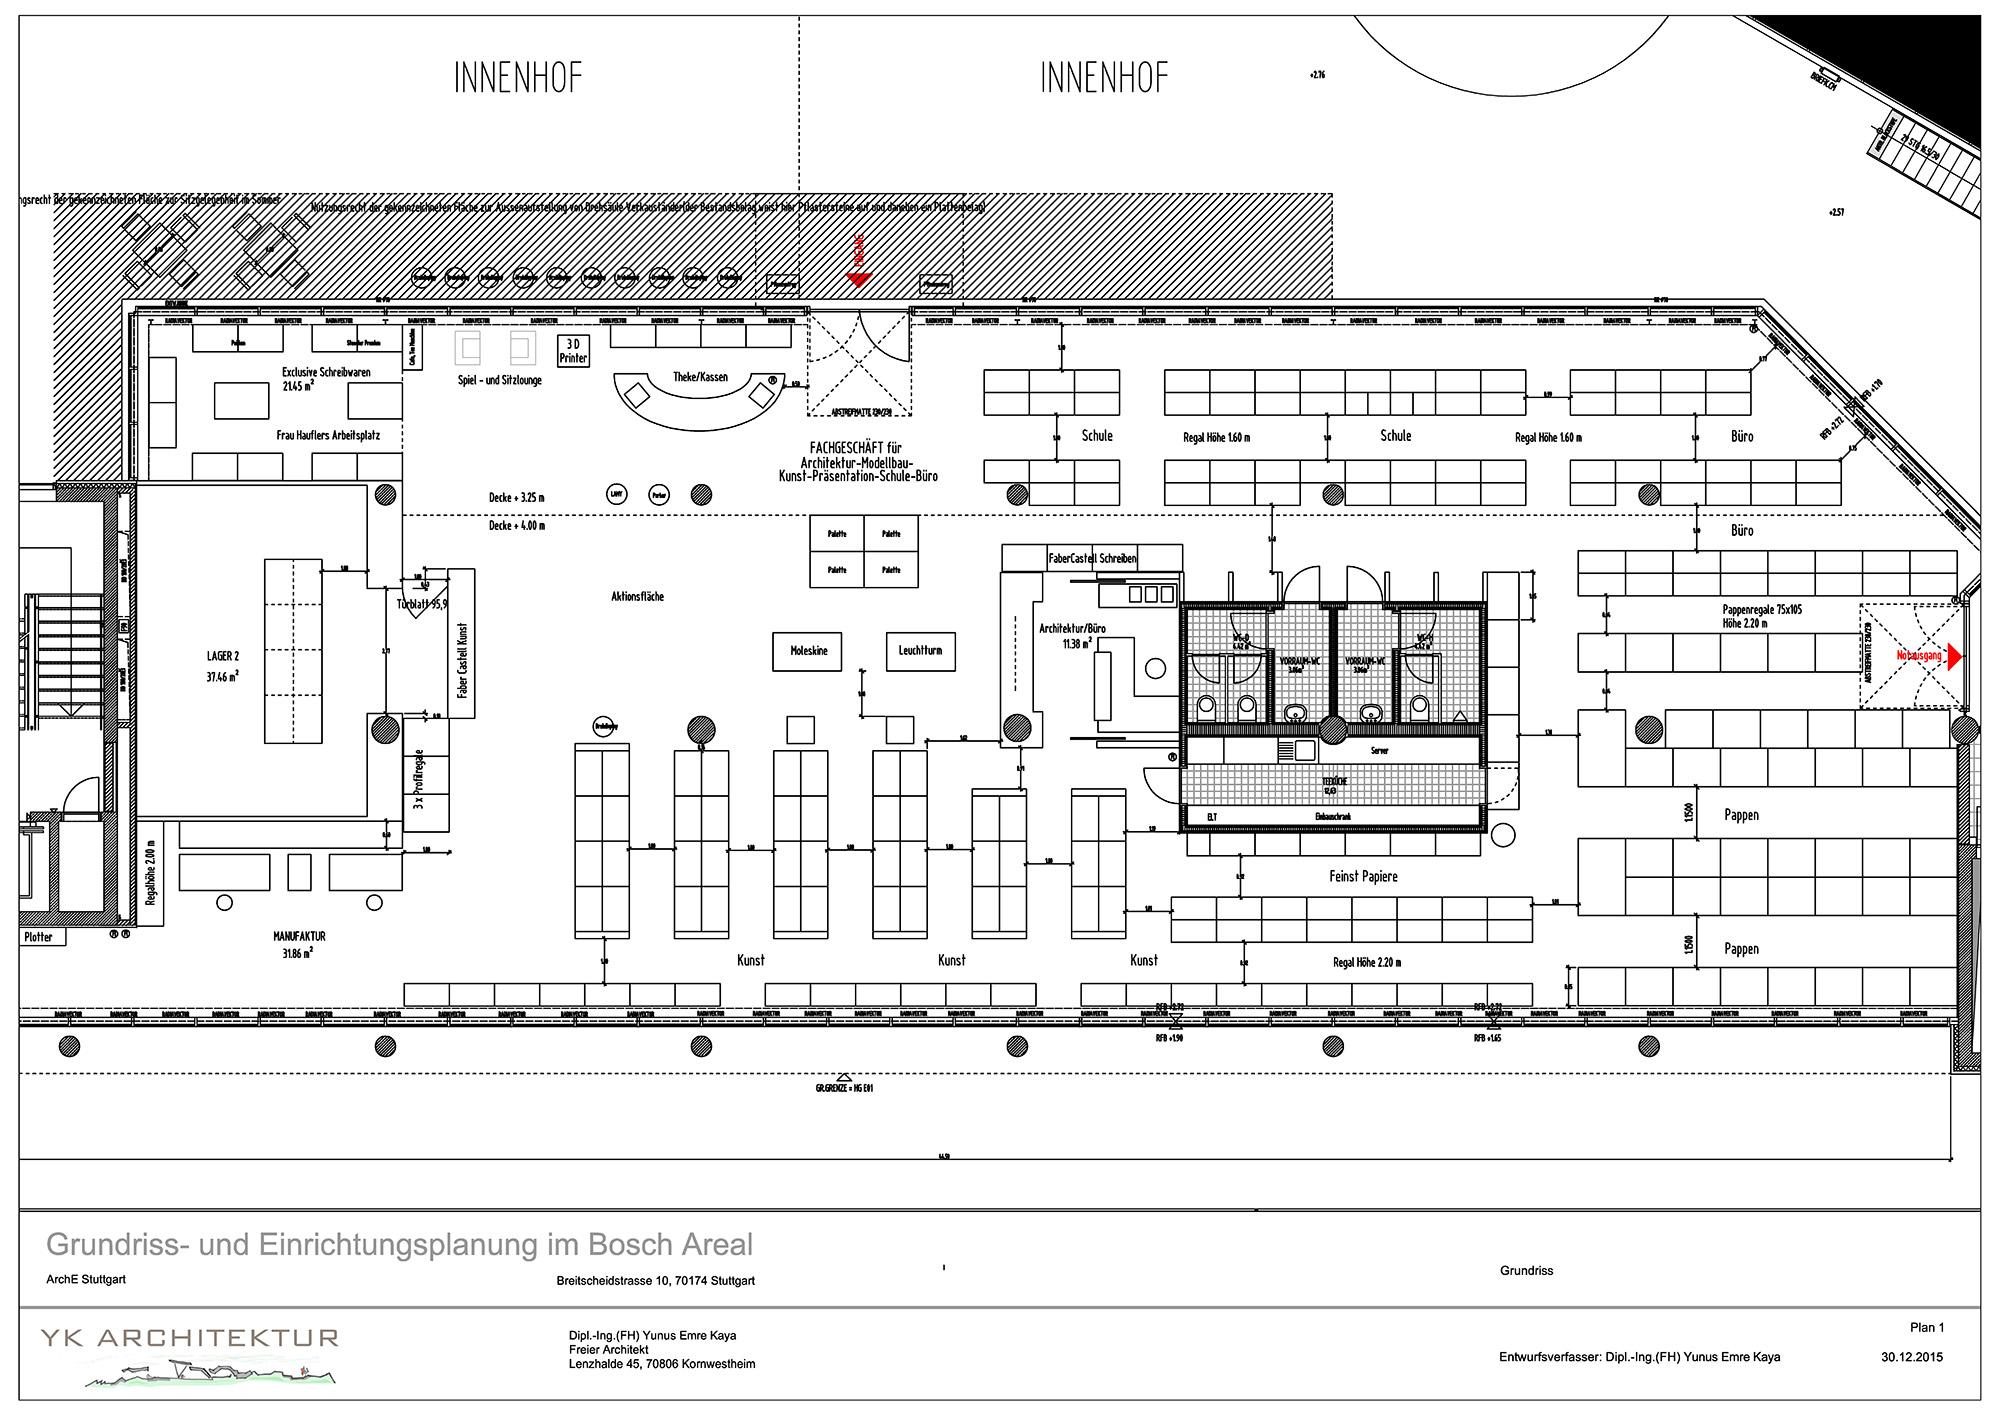 Yk architektur freier architekt yunus emre kaya for Fh stuttgart architektur